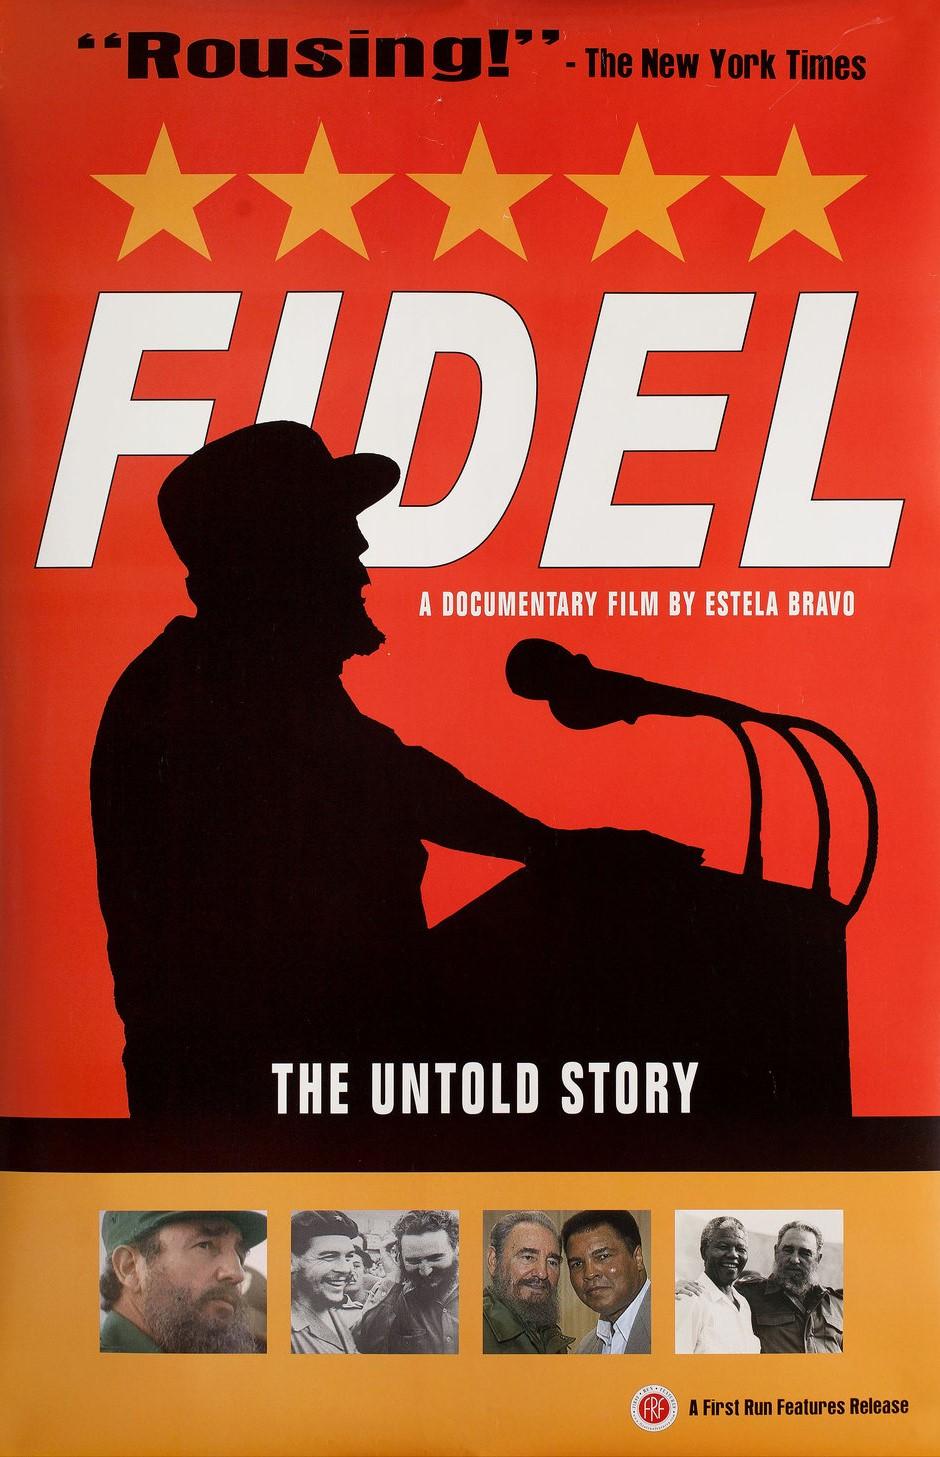 Fidel The untold Story